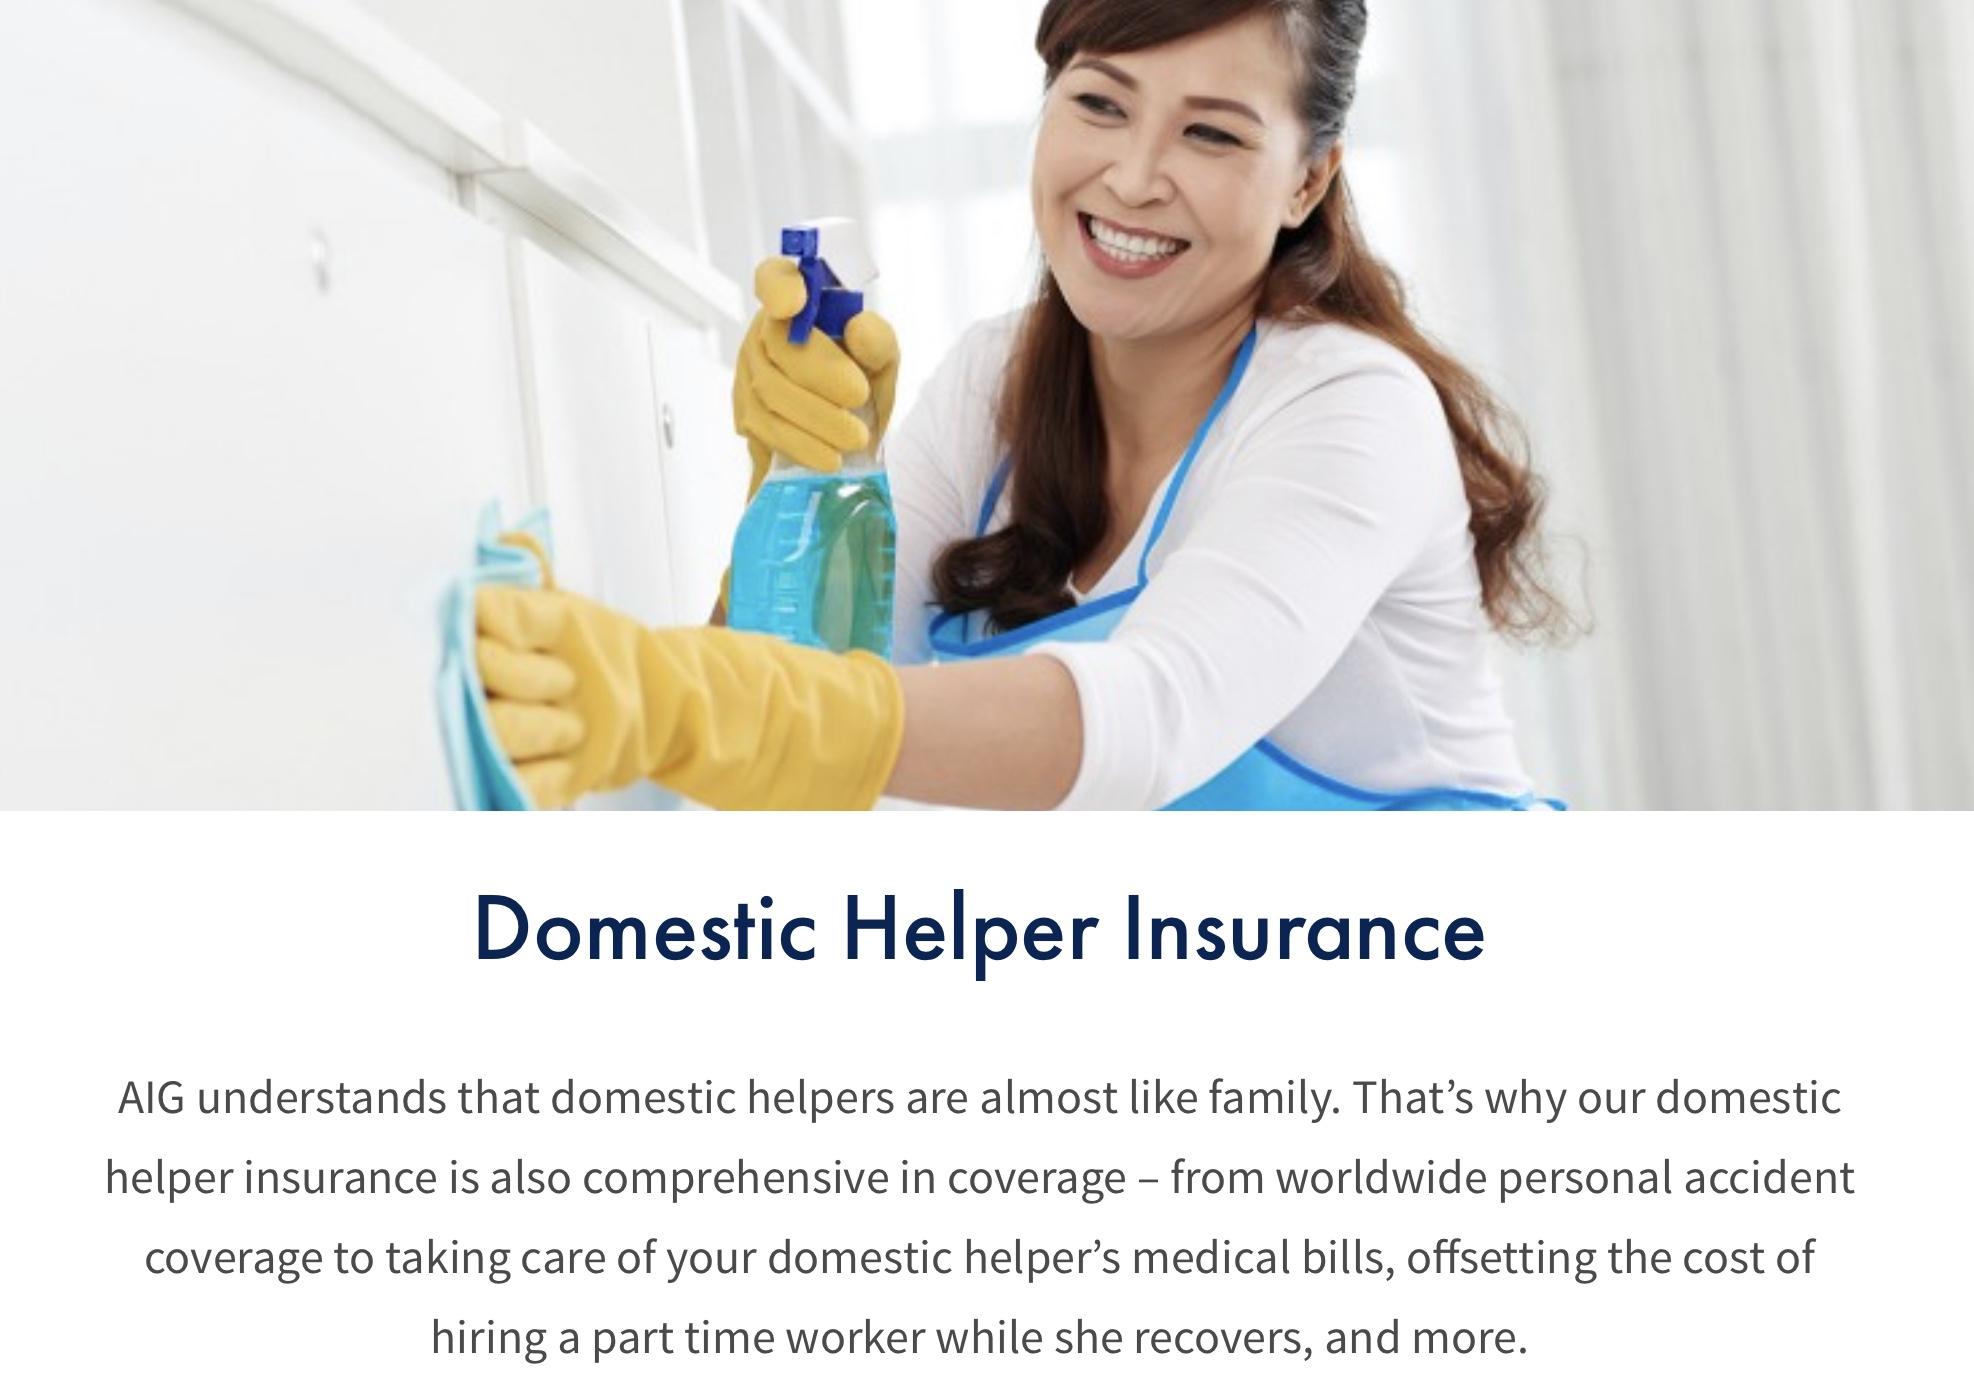 AIG's Domestic Helper Insurance